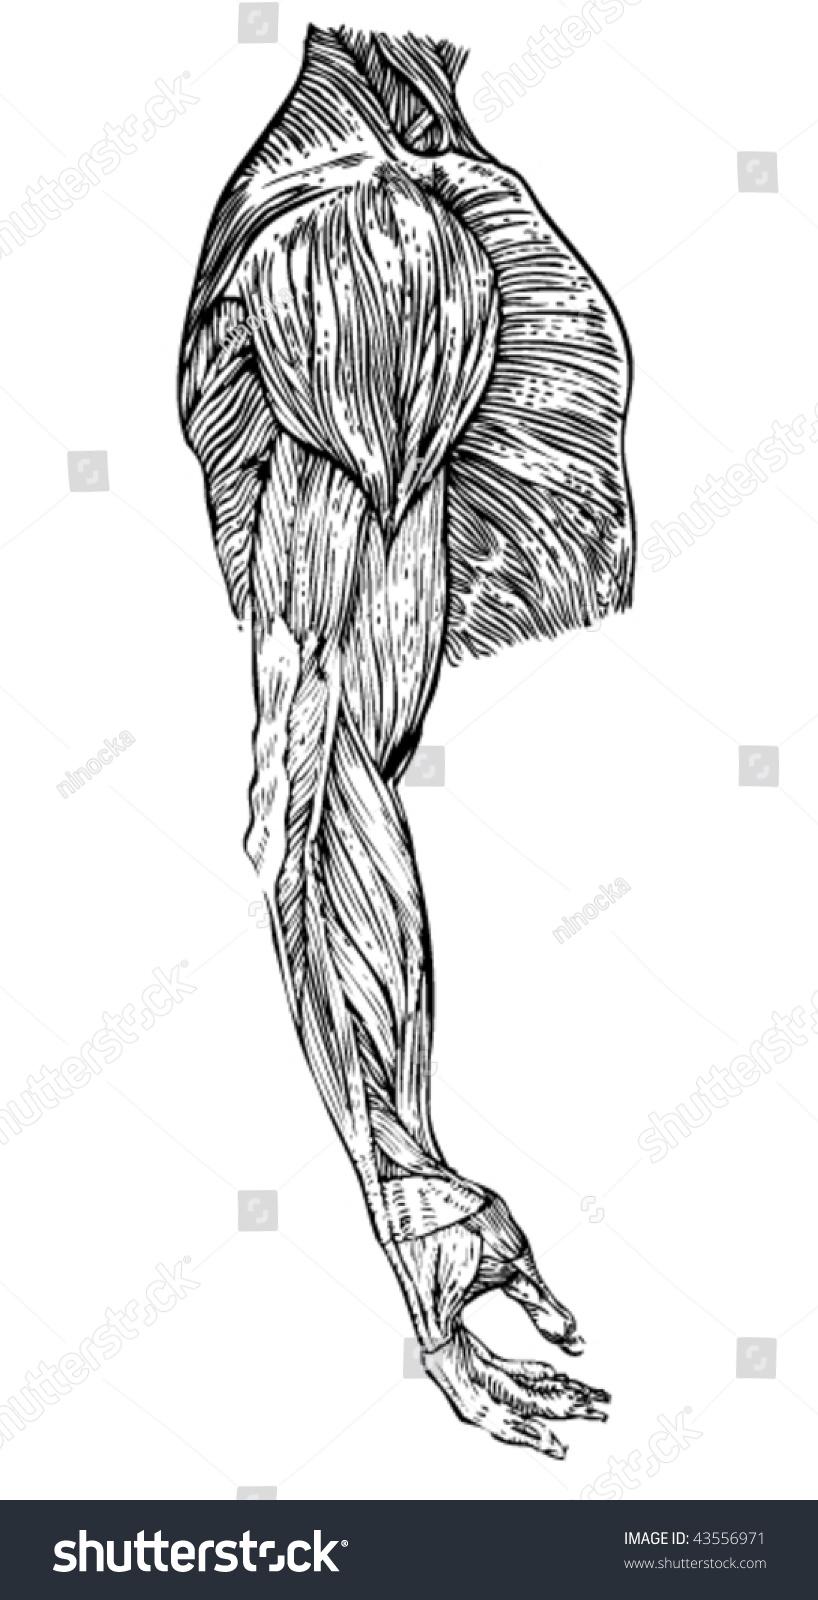 Stock Vector Illustration Human Anatomy Study Stock Vector Royalty